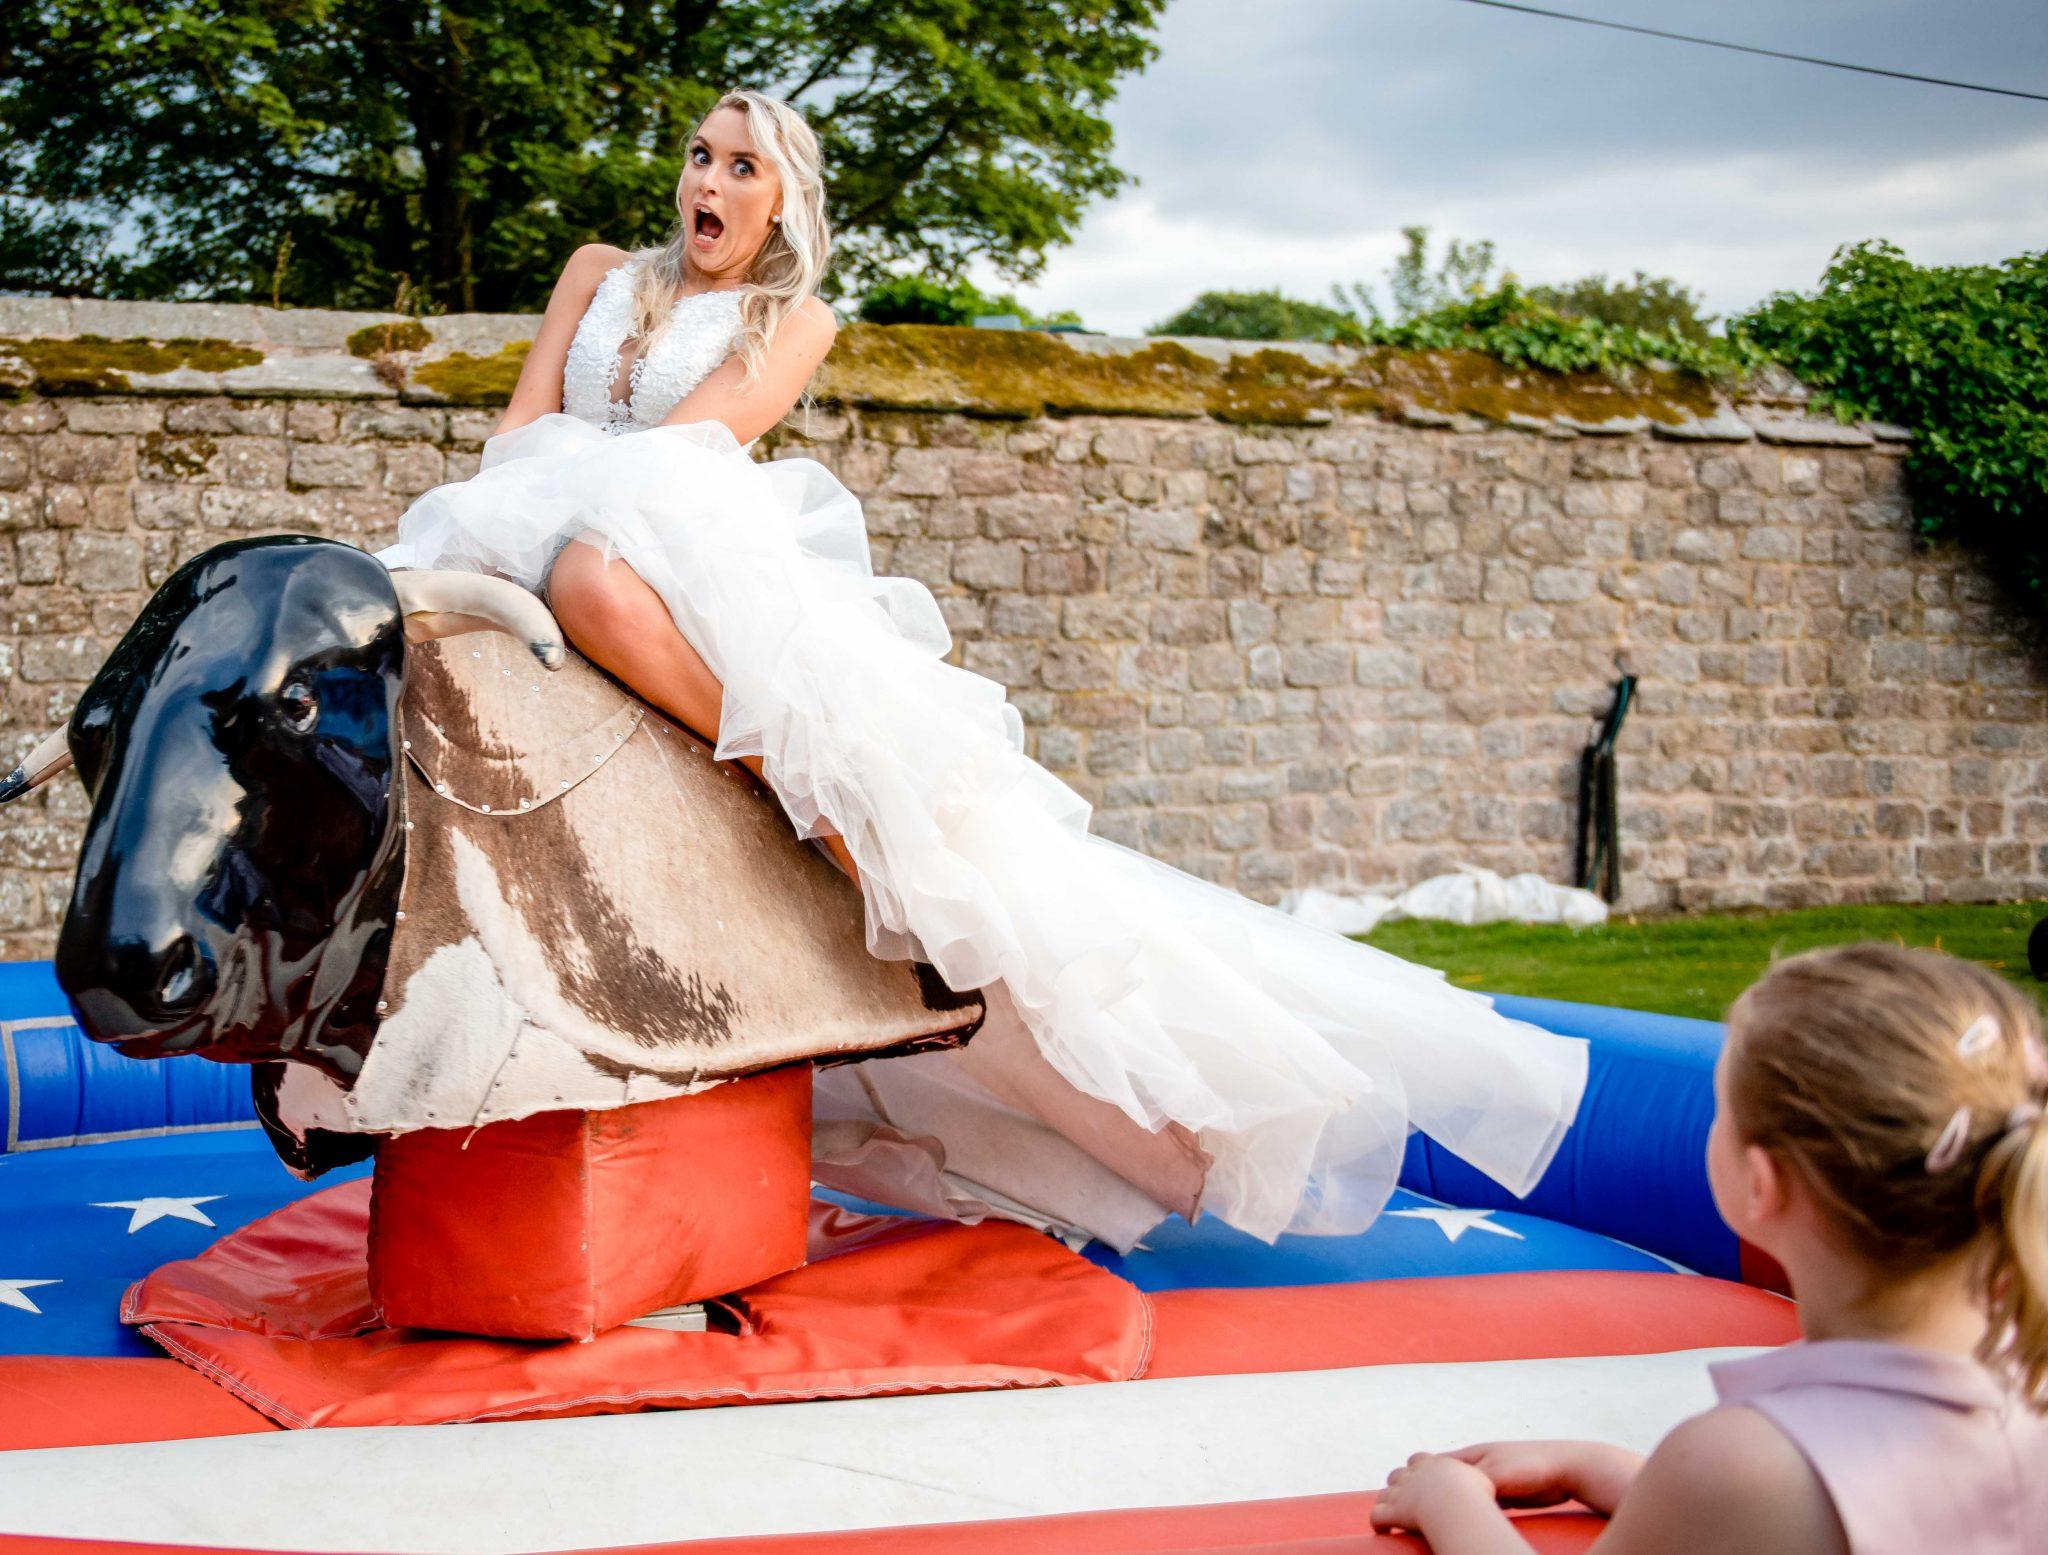 61Emily-and-Bernard-Ashton-Memorial-Lancaster-Wedding-Photography-by-Ollie-Gyte-Photography